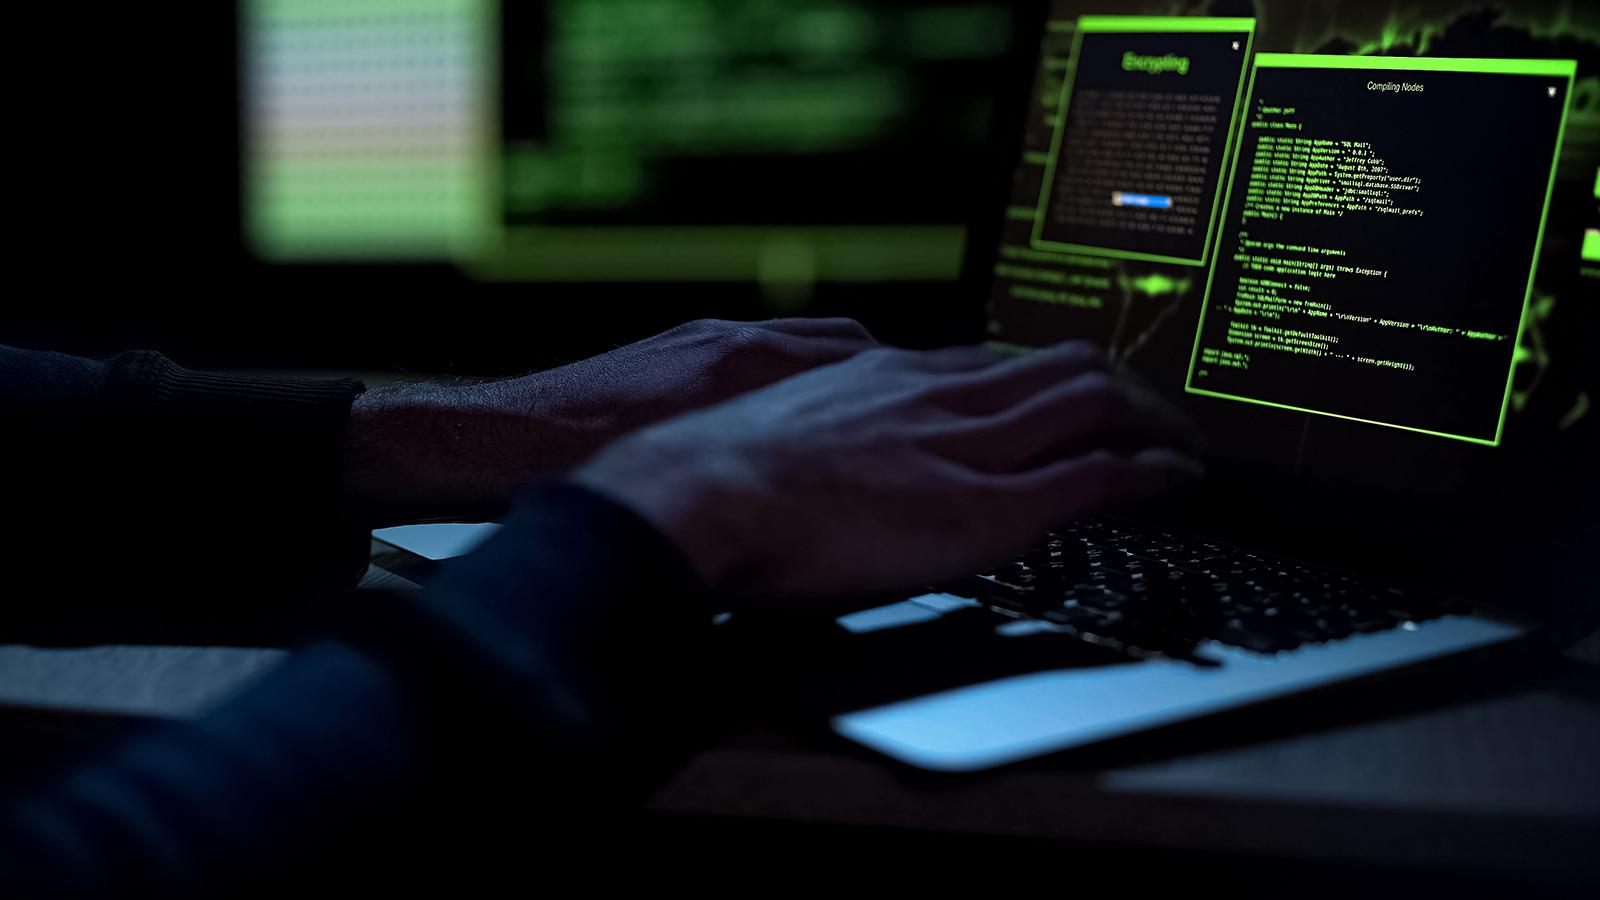 Bitdefender, Cybercriminals, Intel, Data